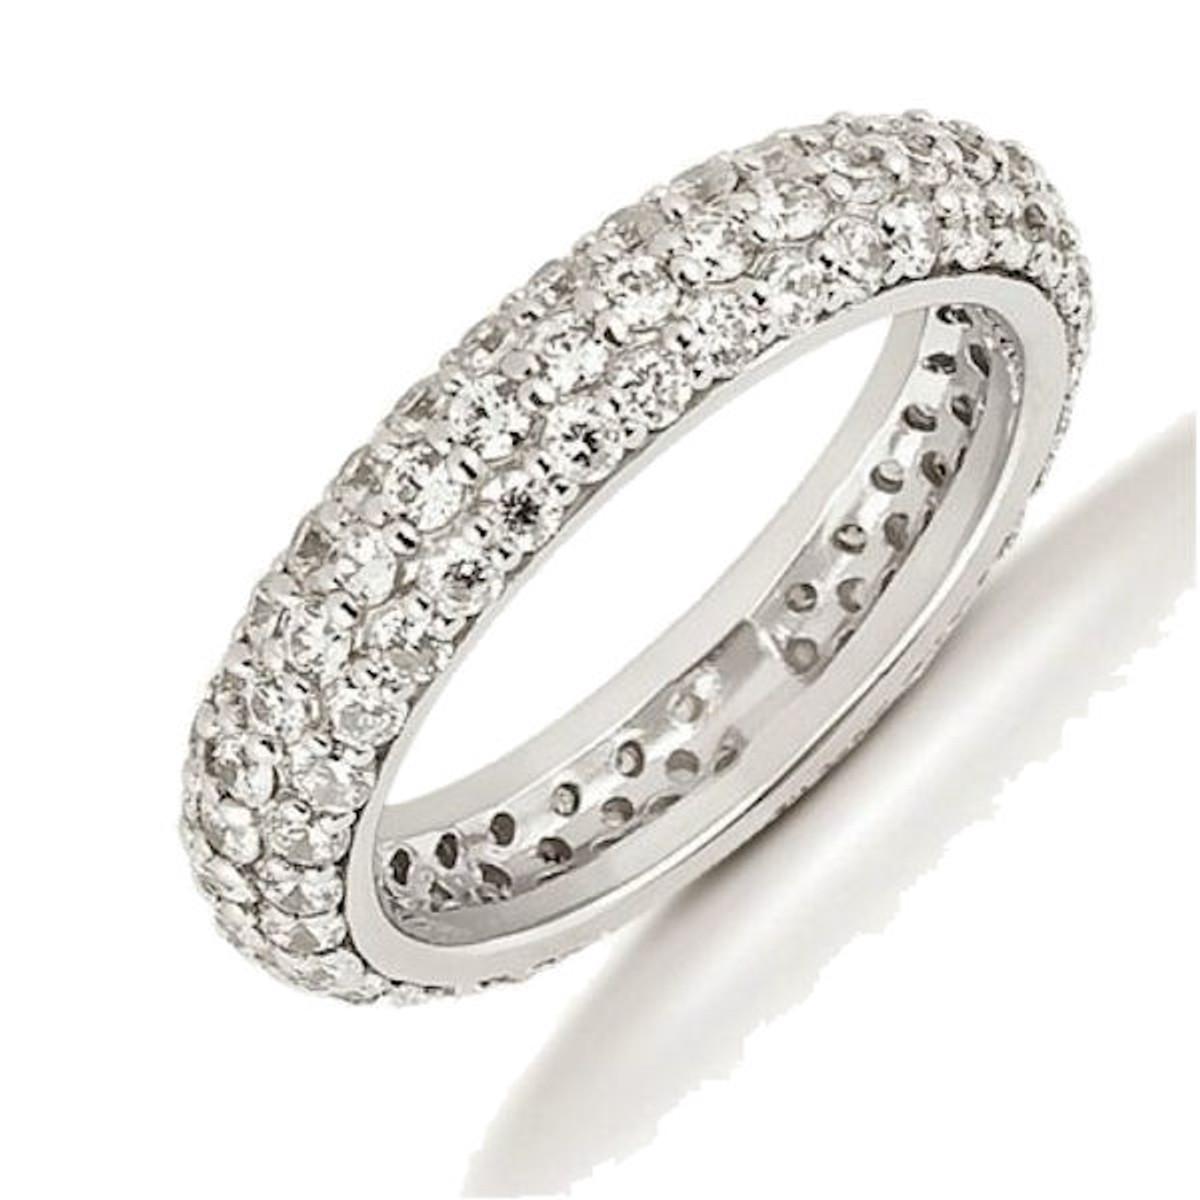 Platinum 3-row 1.70 ct tw Diamond Eternity Ring